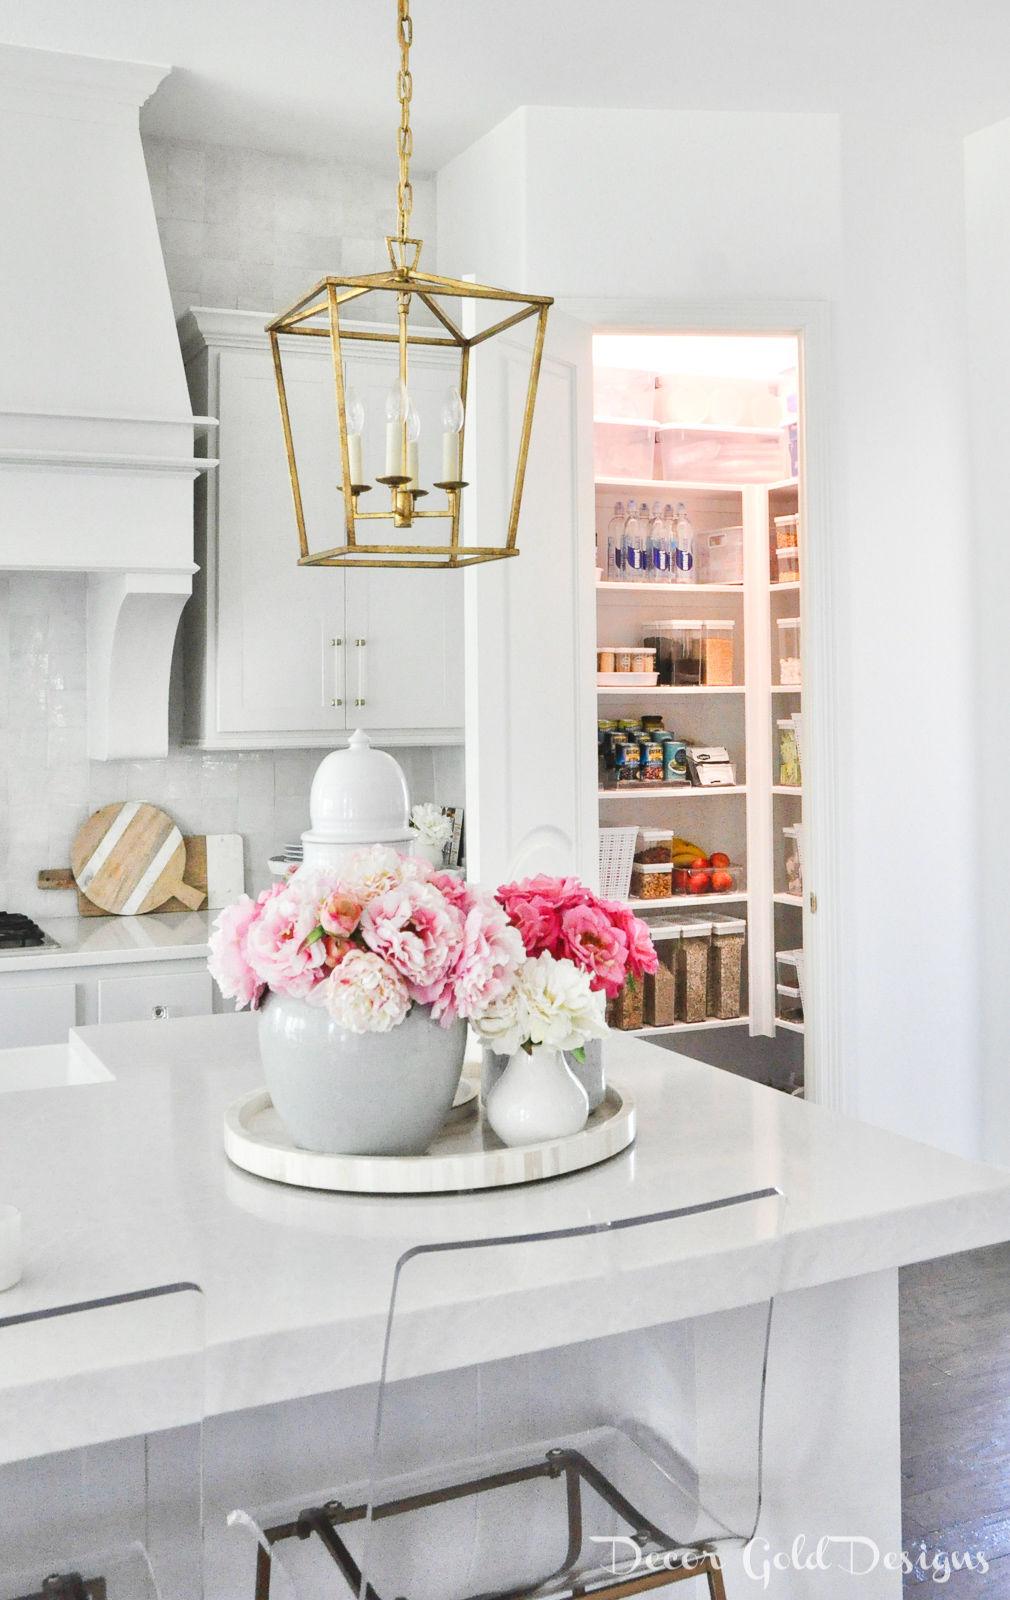 Bright organized corner pantry in a white kitchen